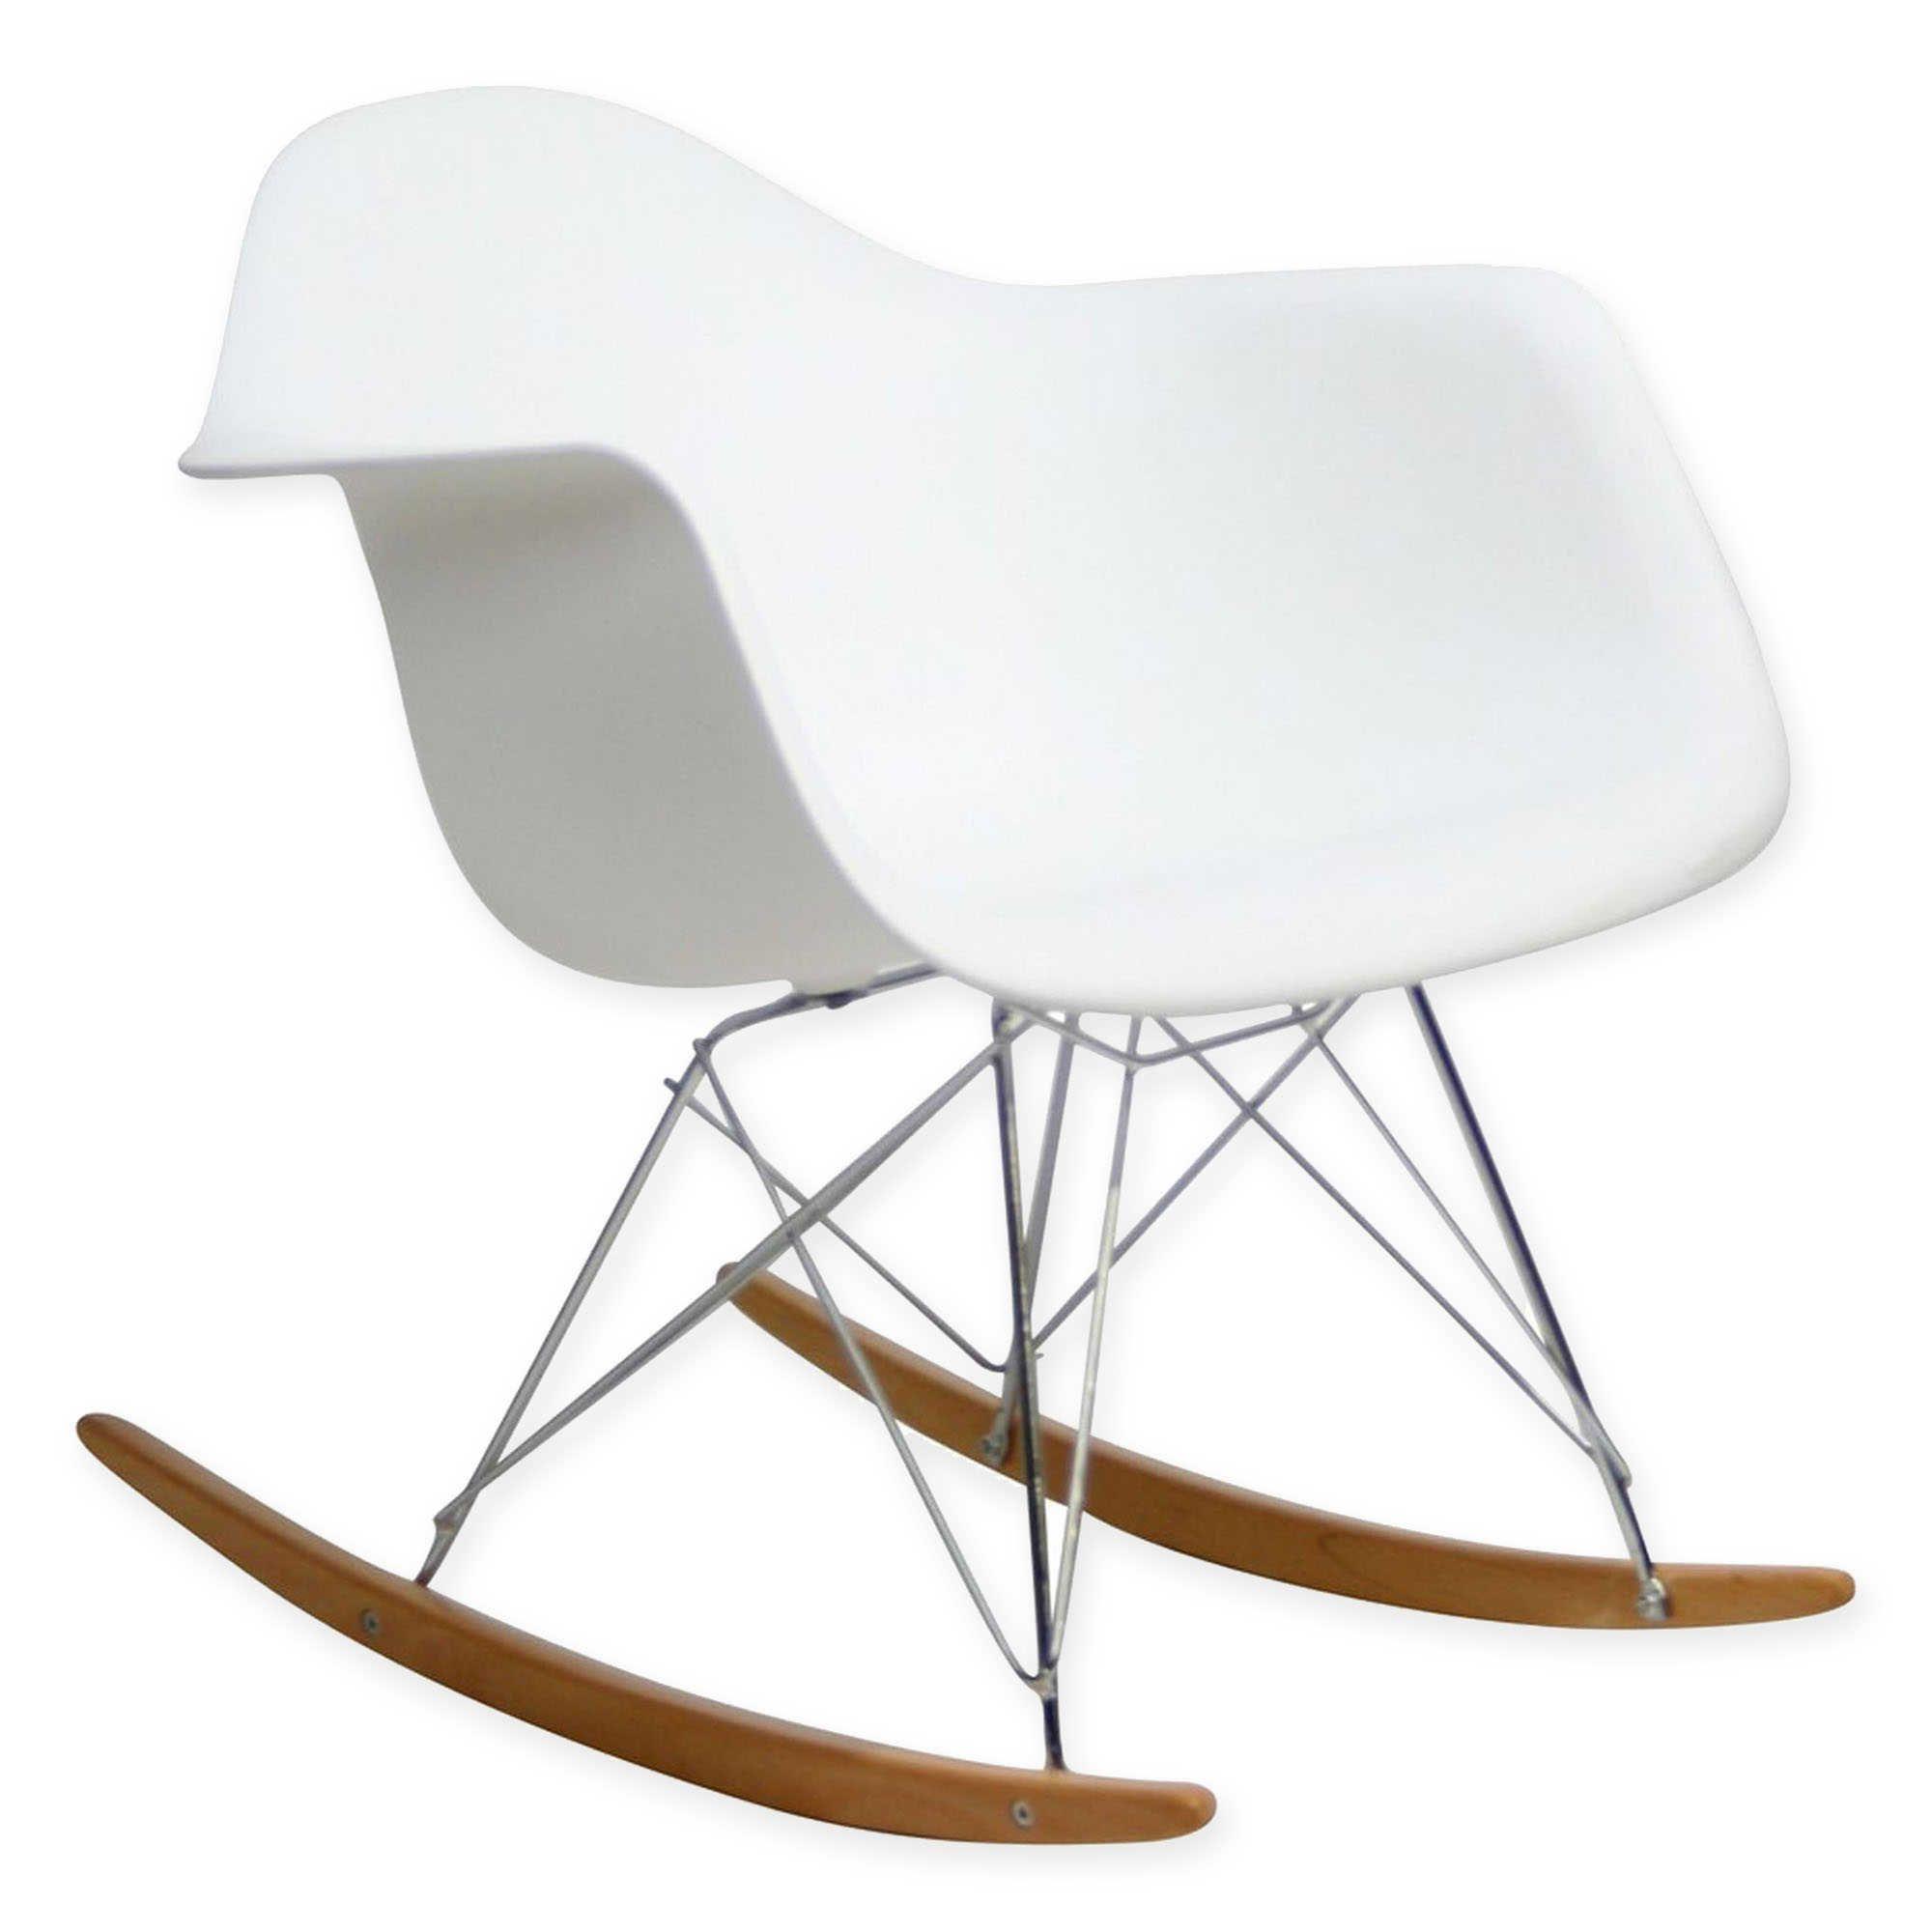 Admirable Rocker Lounge Chair Machost Co Dining Chair Design Ideas Machostcouk